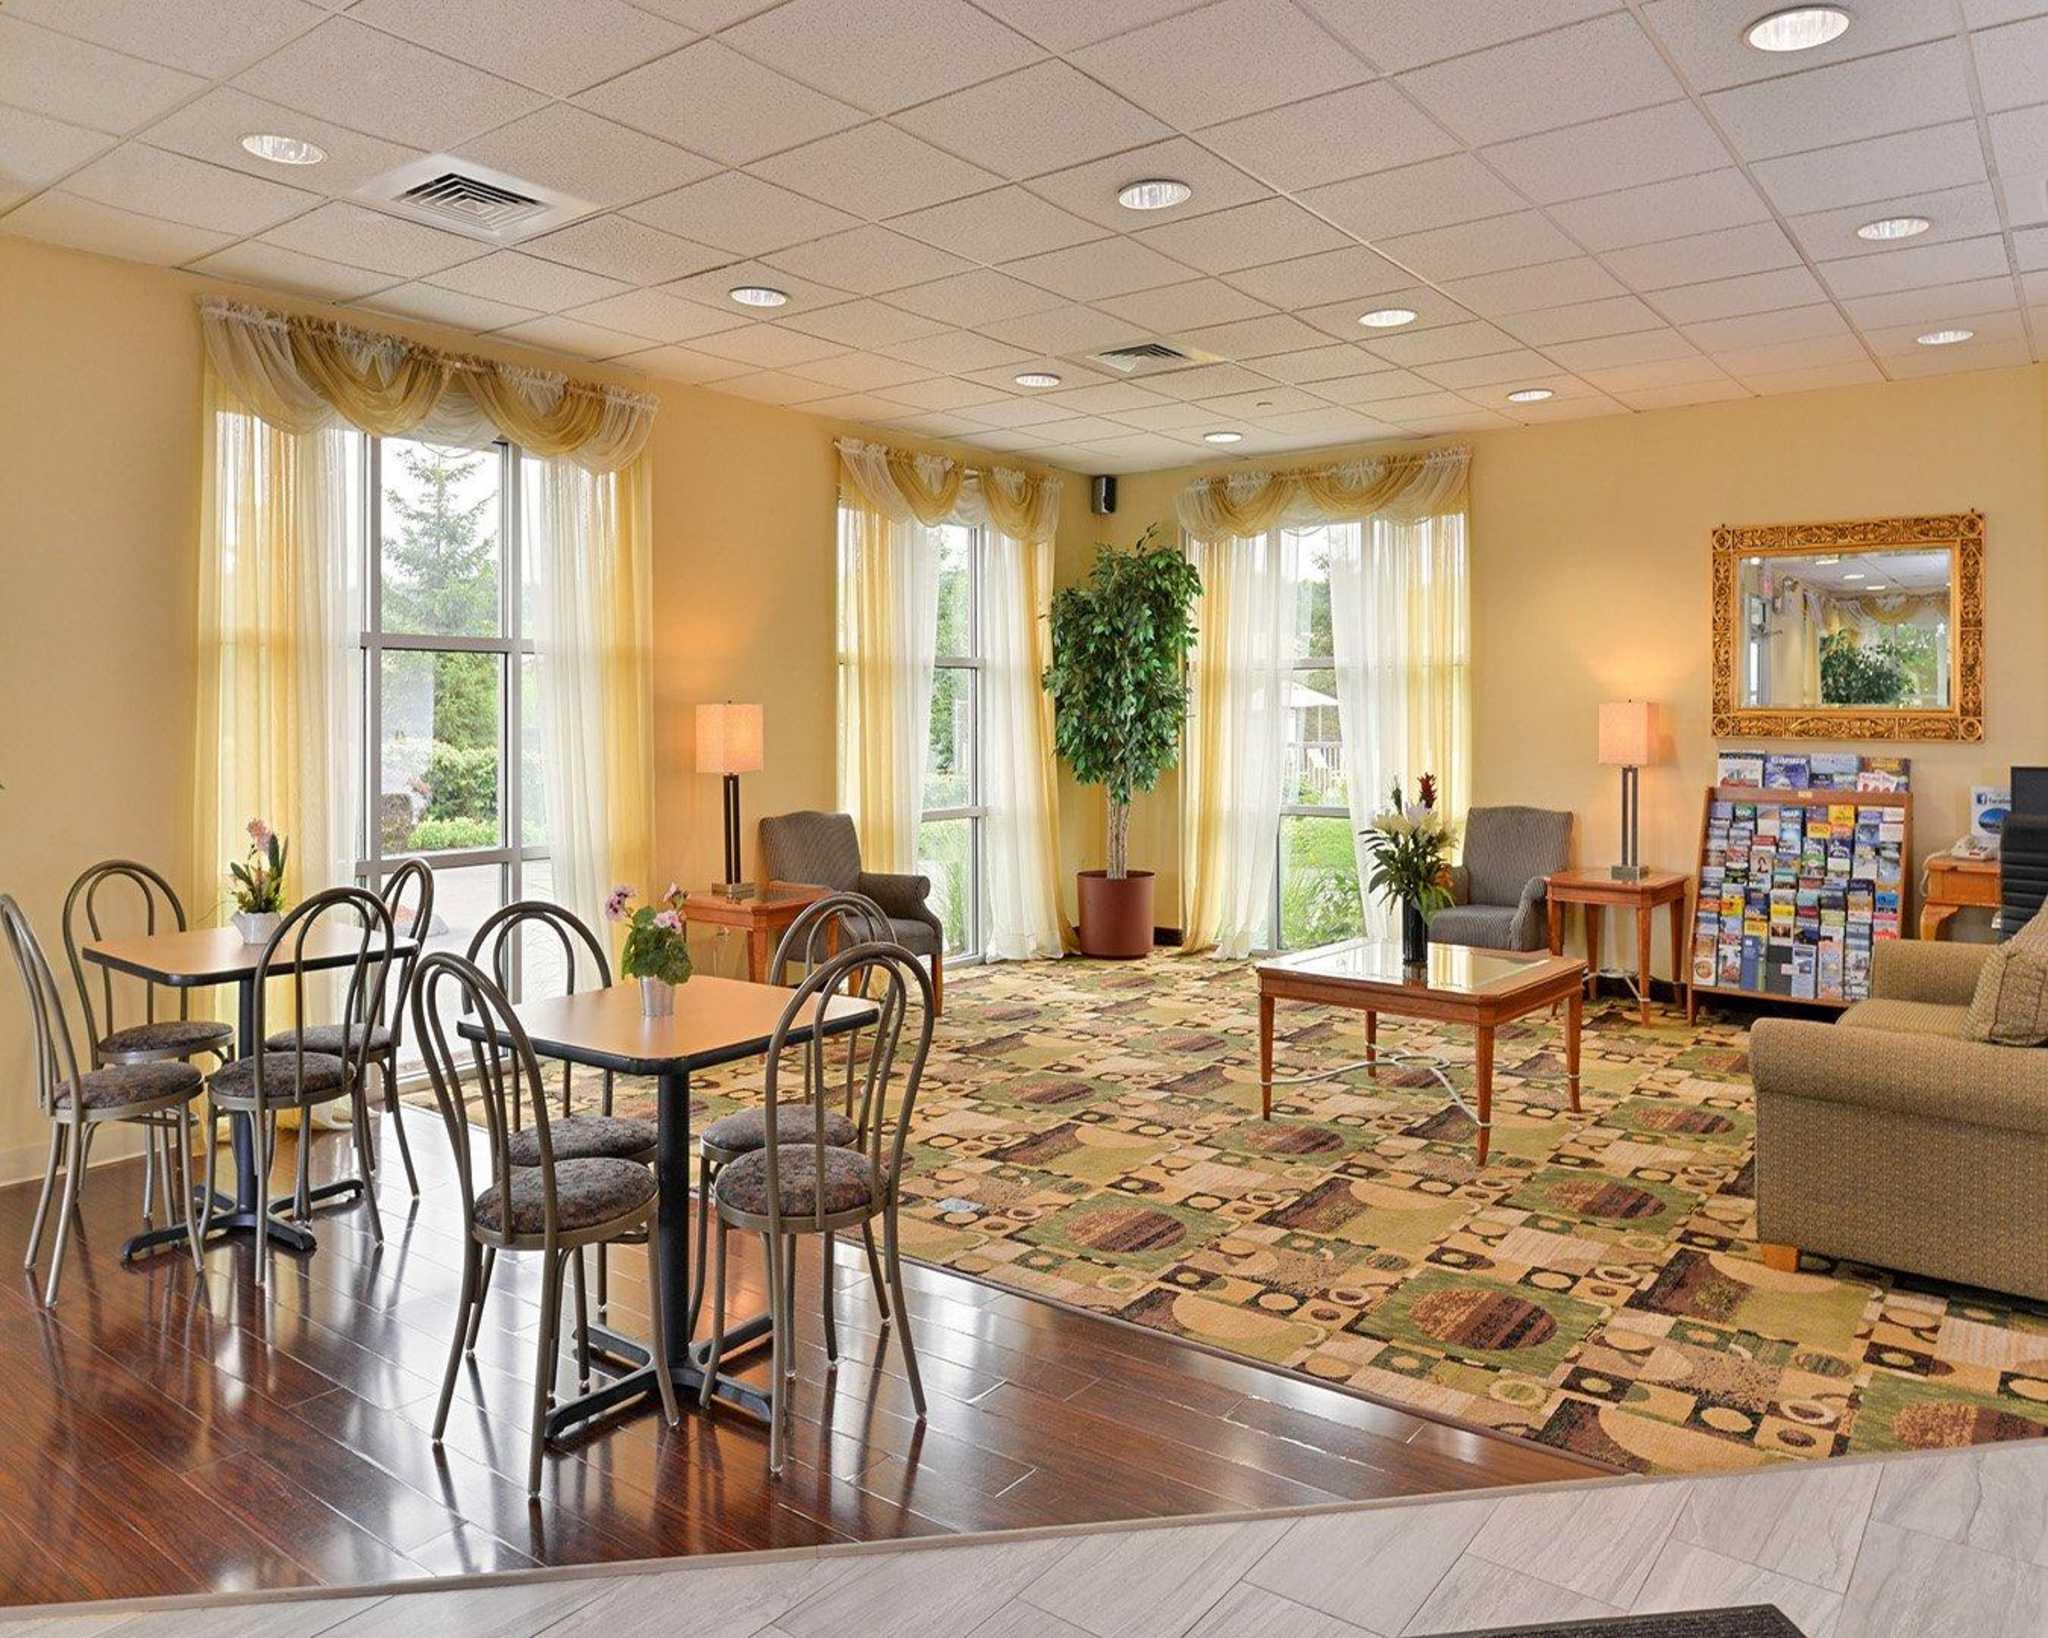 All Hilton Garden Inn Hotels in West Haven, CT ($50